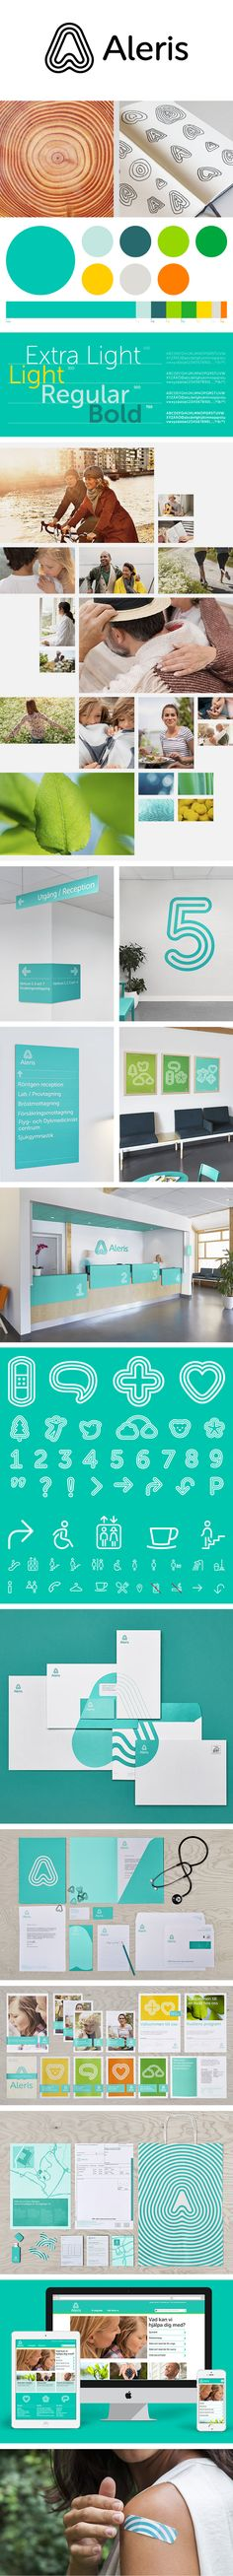 More corporate-designs are collected on: https://pinterest.com/rothenhaeusler/best-of-corporate-design/ · Agency: Bold · Client: Aleris · Source: http://www.boldscandinavia.com/work/aleris/ #branding #identity #corporatedesign